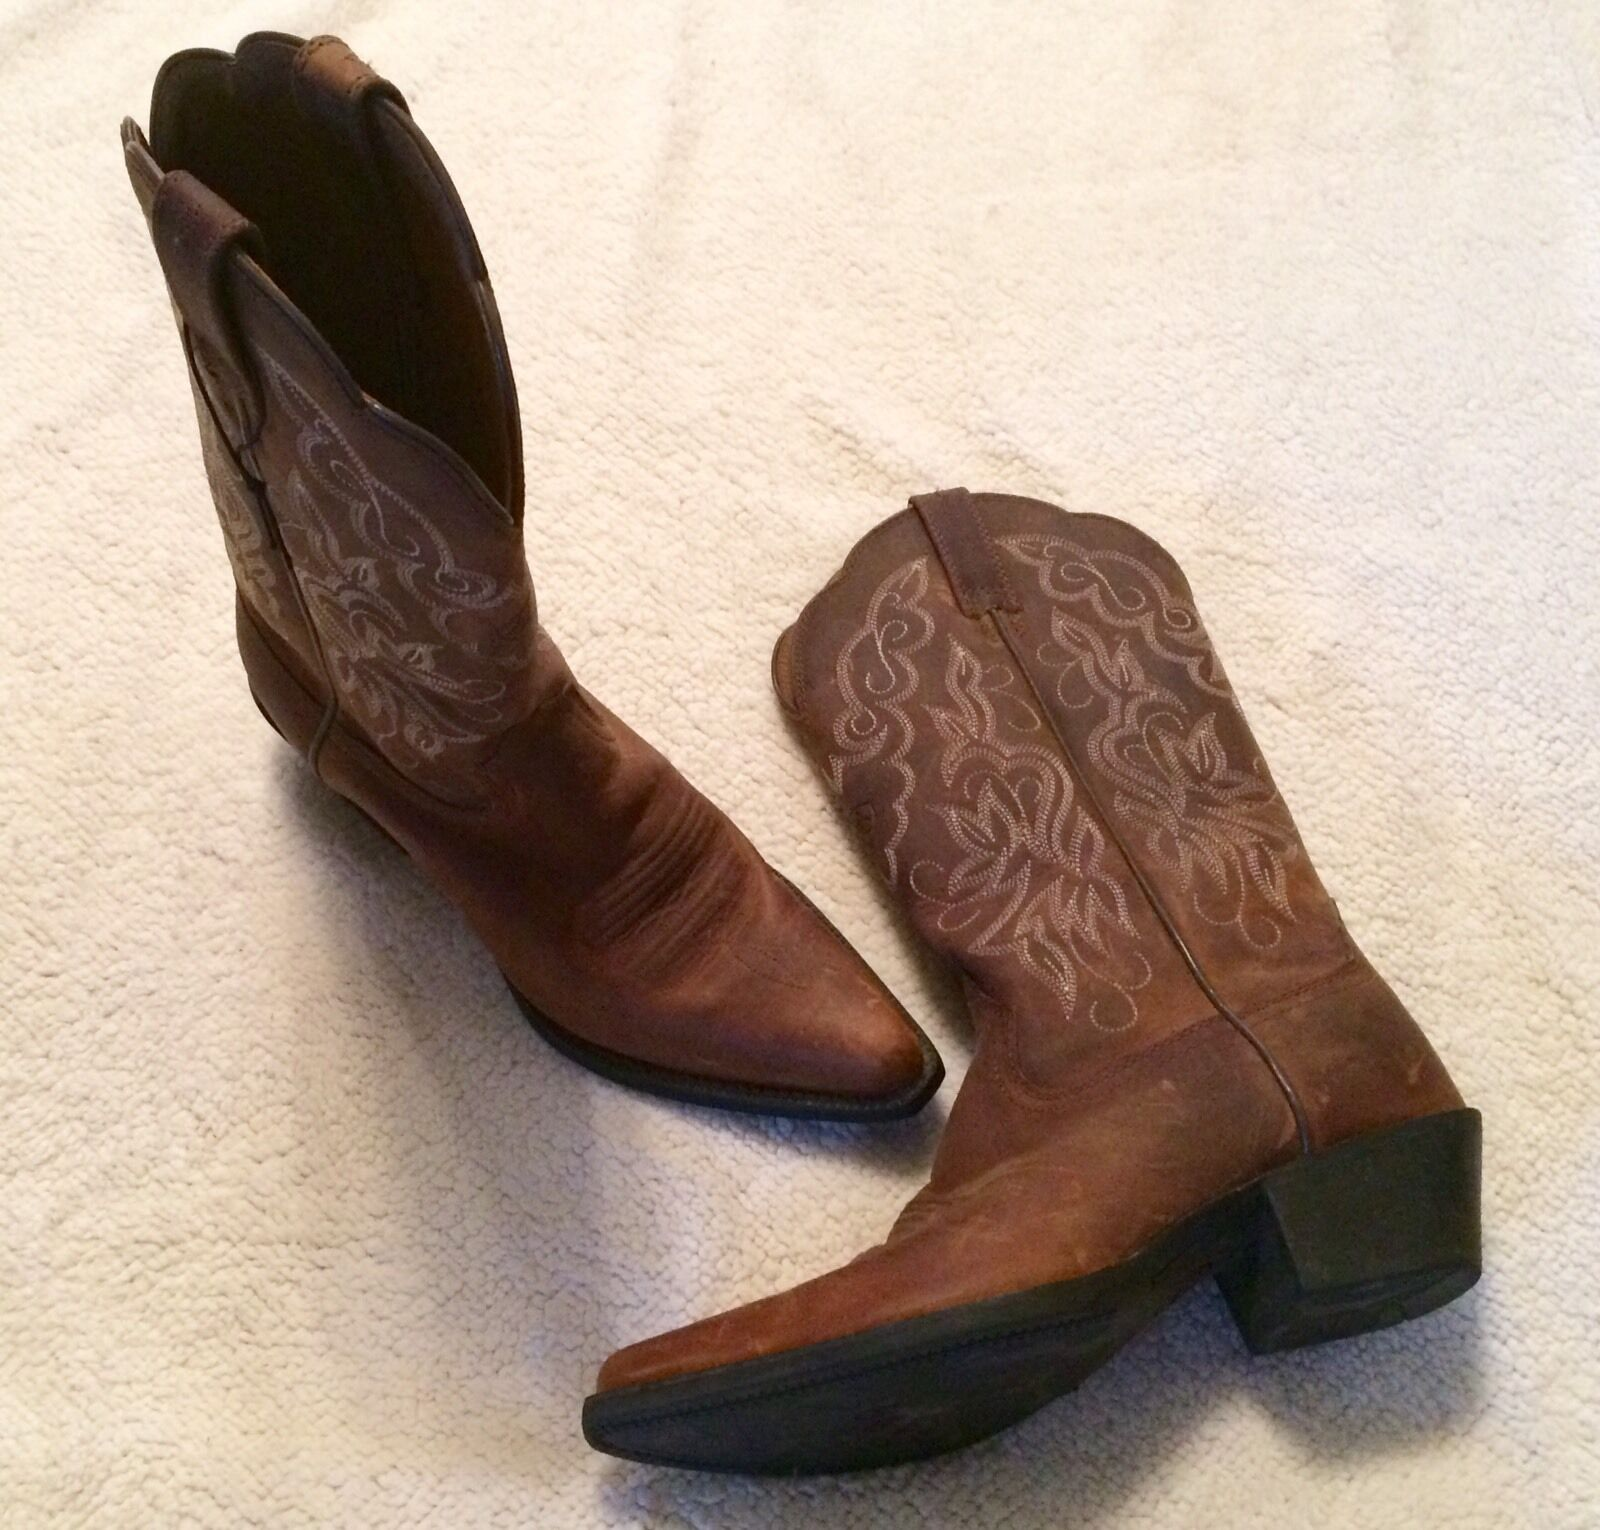 Ariat ATS Weathered X Toe Cowboy Boots 12 12 12  SZ 5.5 B VERY NICE 9332fa